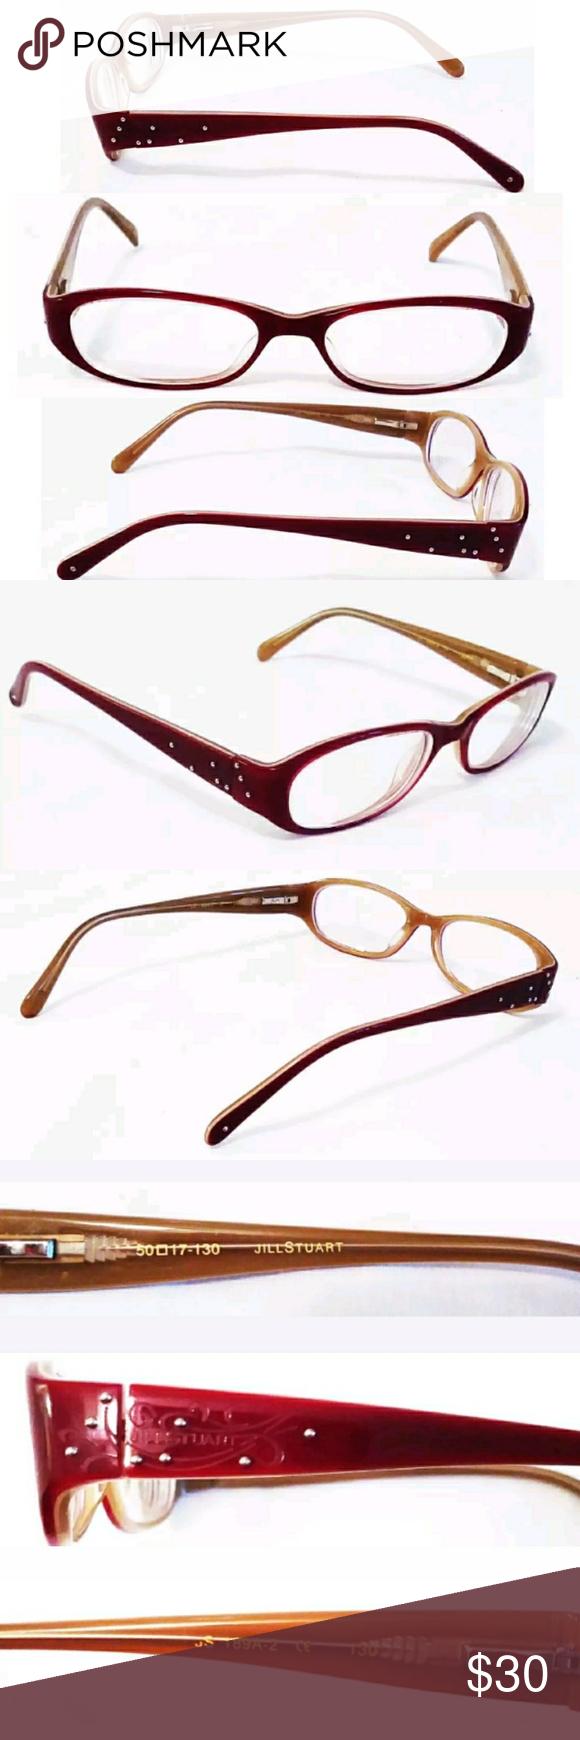 Jill Stuart RX Eyeglasses   To be, Models and Eyeglasses